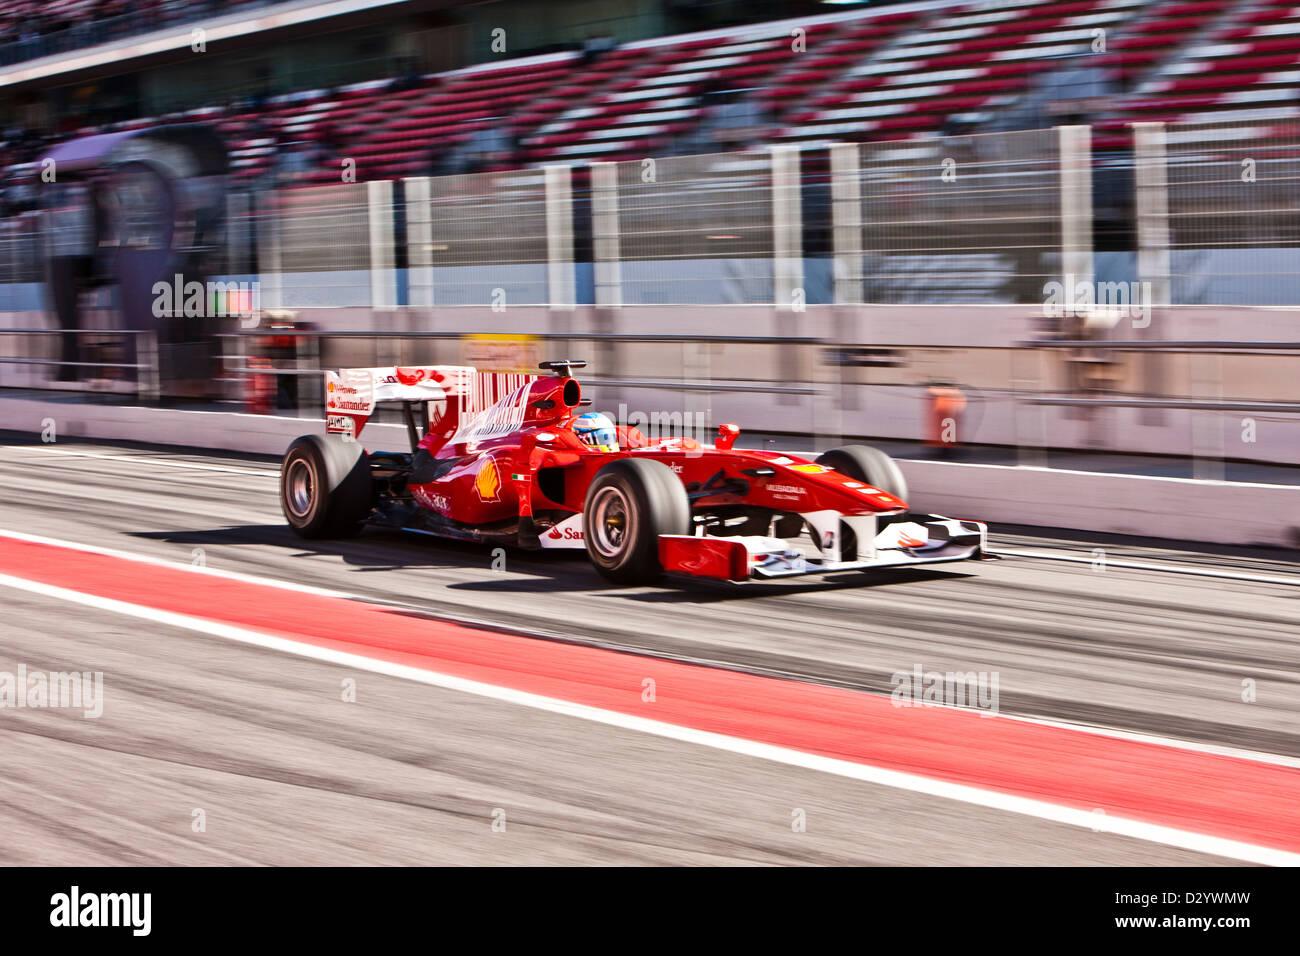 Formula one car action, Barcelona, 27 02 10 - Stock Image